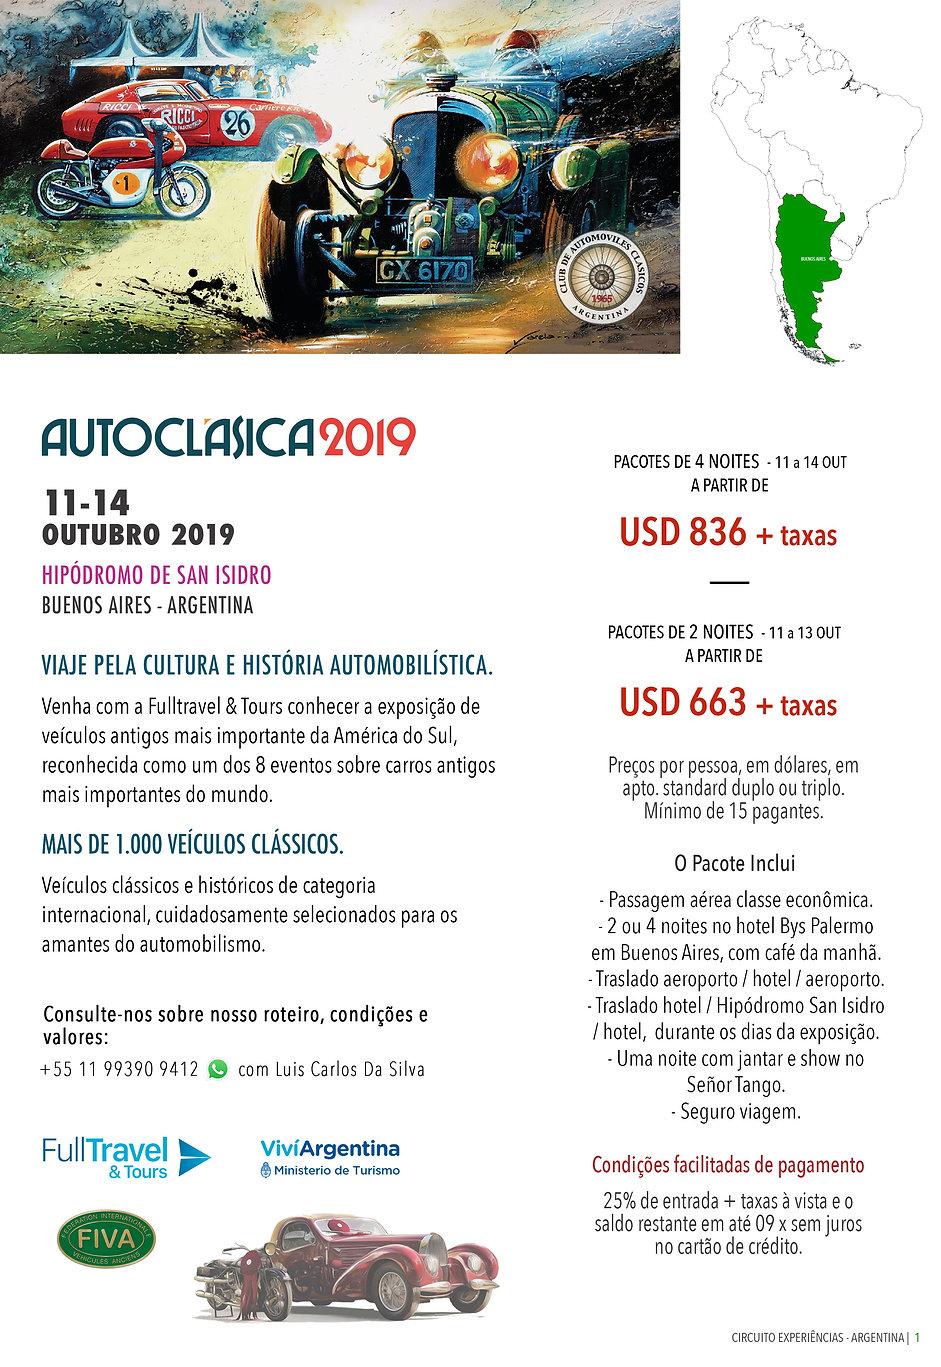 Roteiro Autoclasico2019 - Argentina.jpg